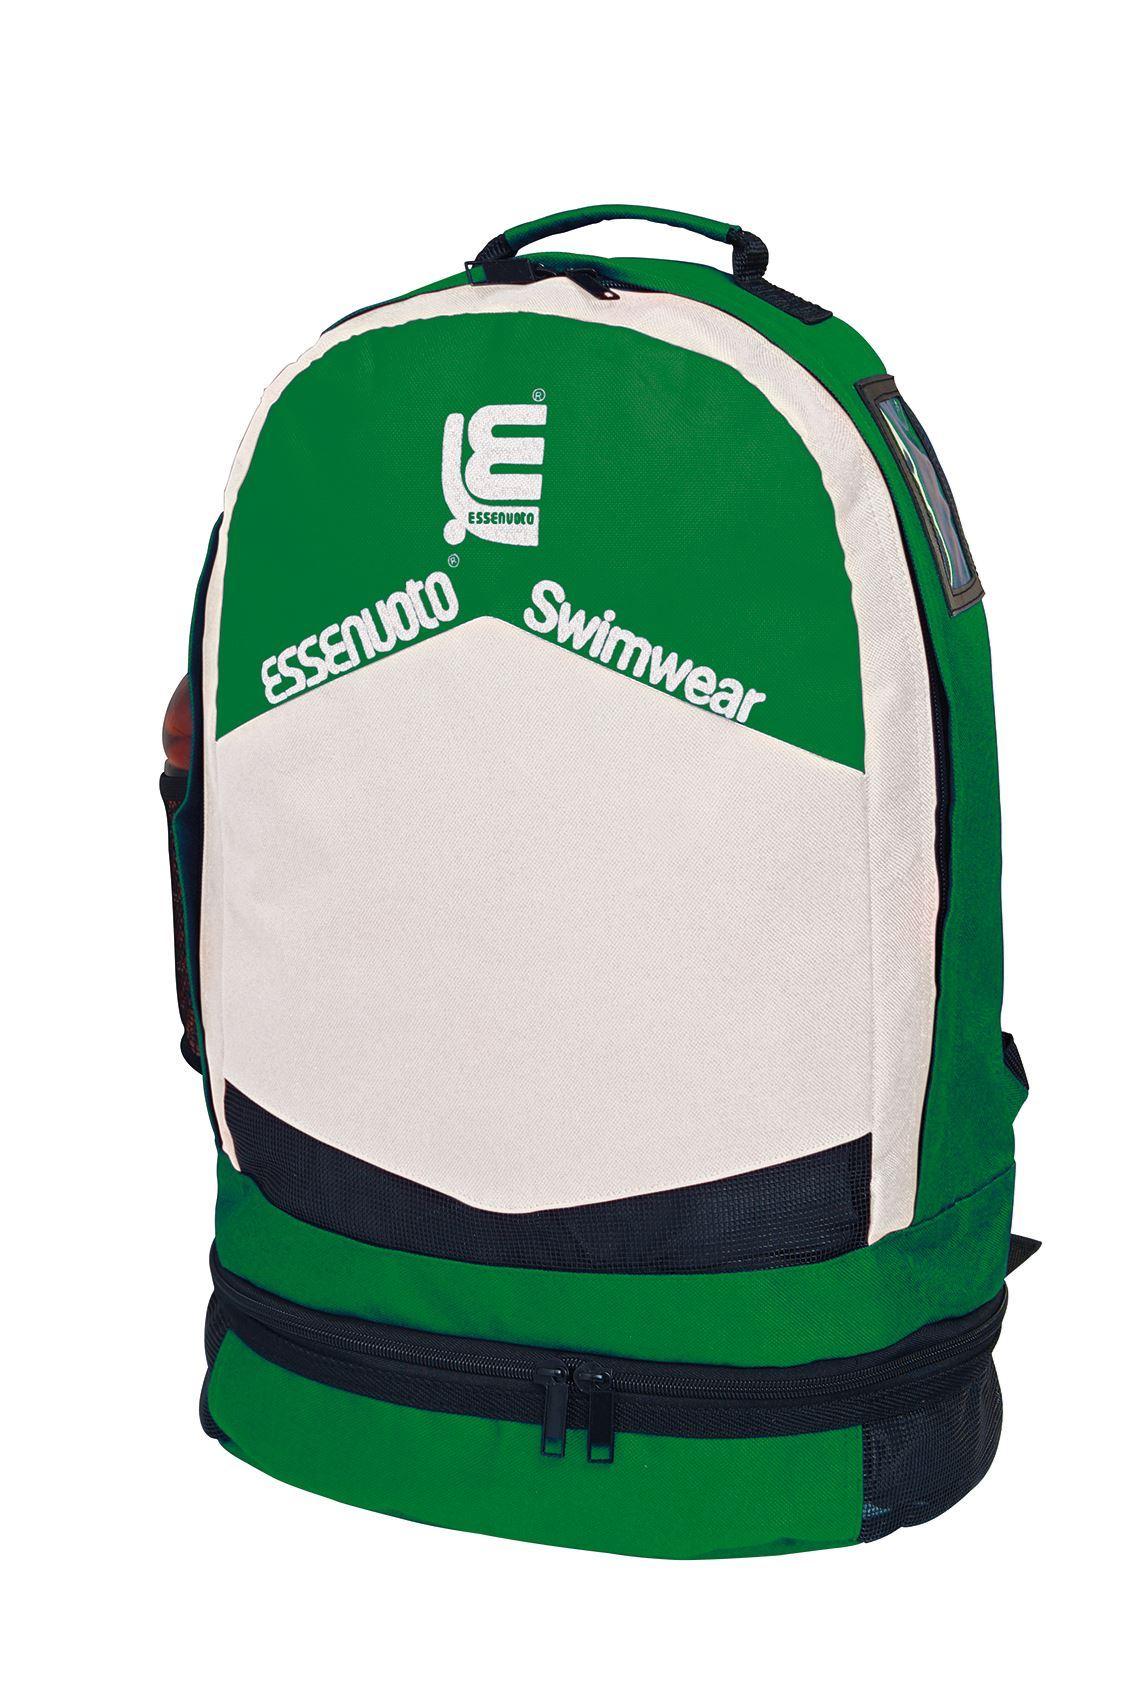 200002 - BACK PACK GREEN WHITE WITH SOFT SHOULDER STRAP